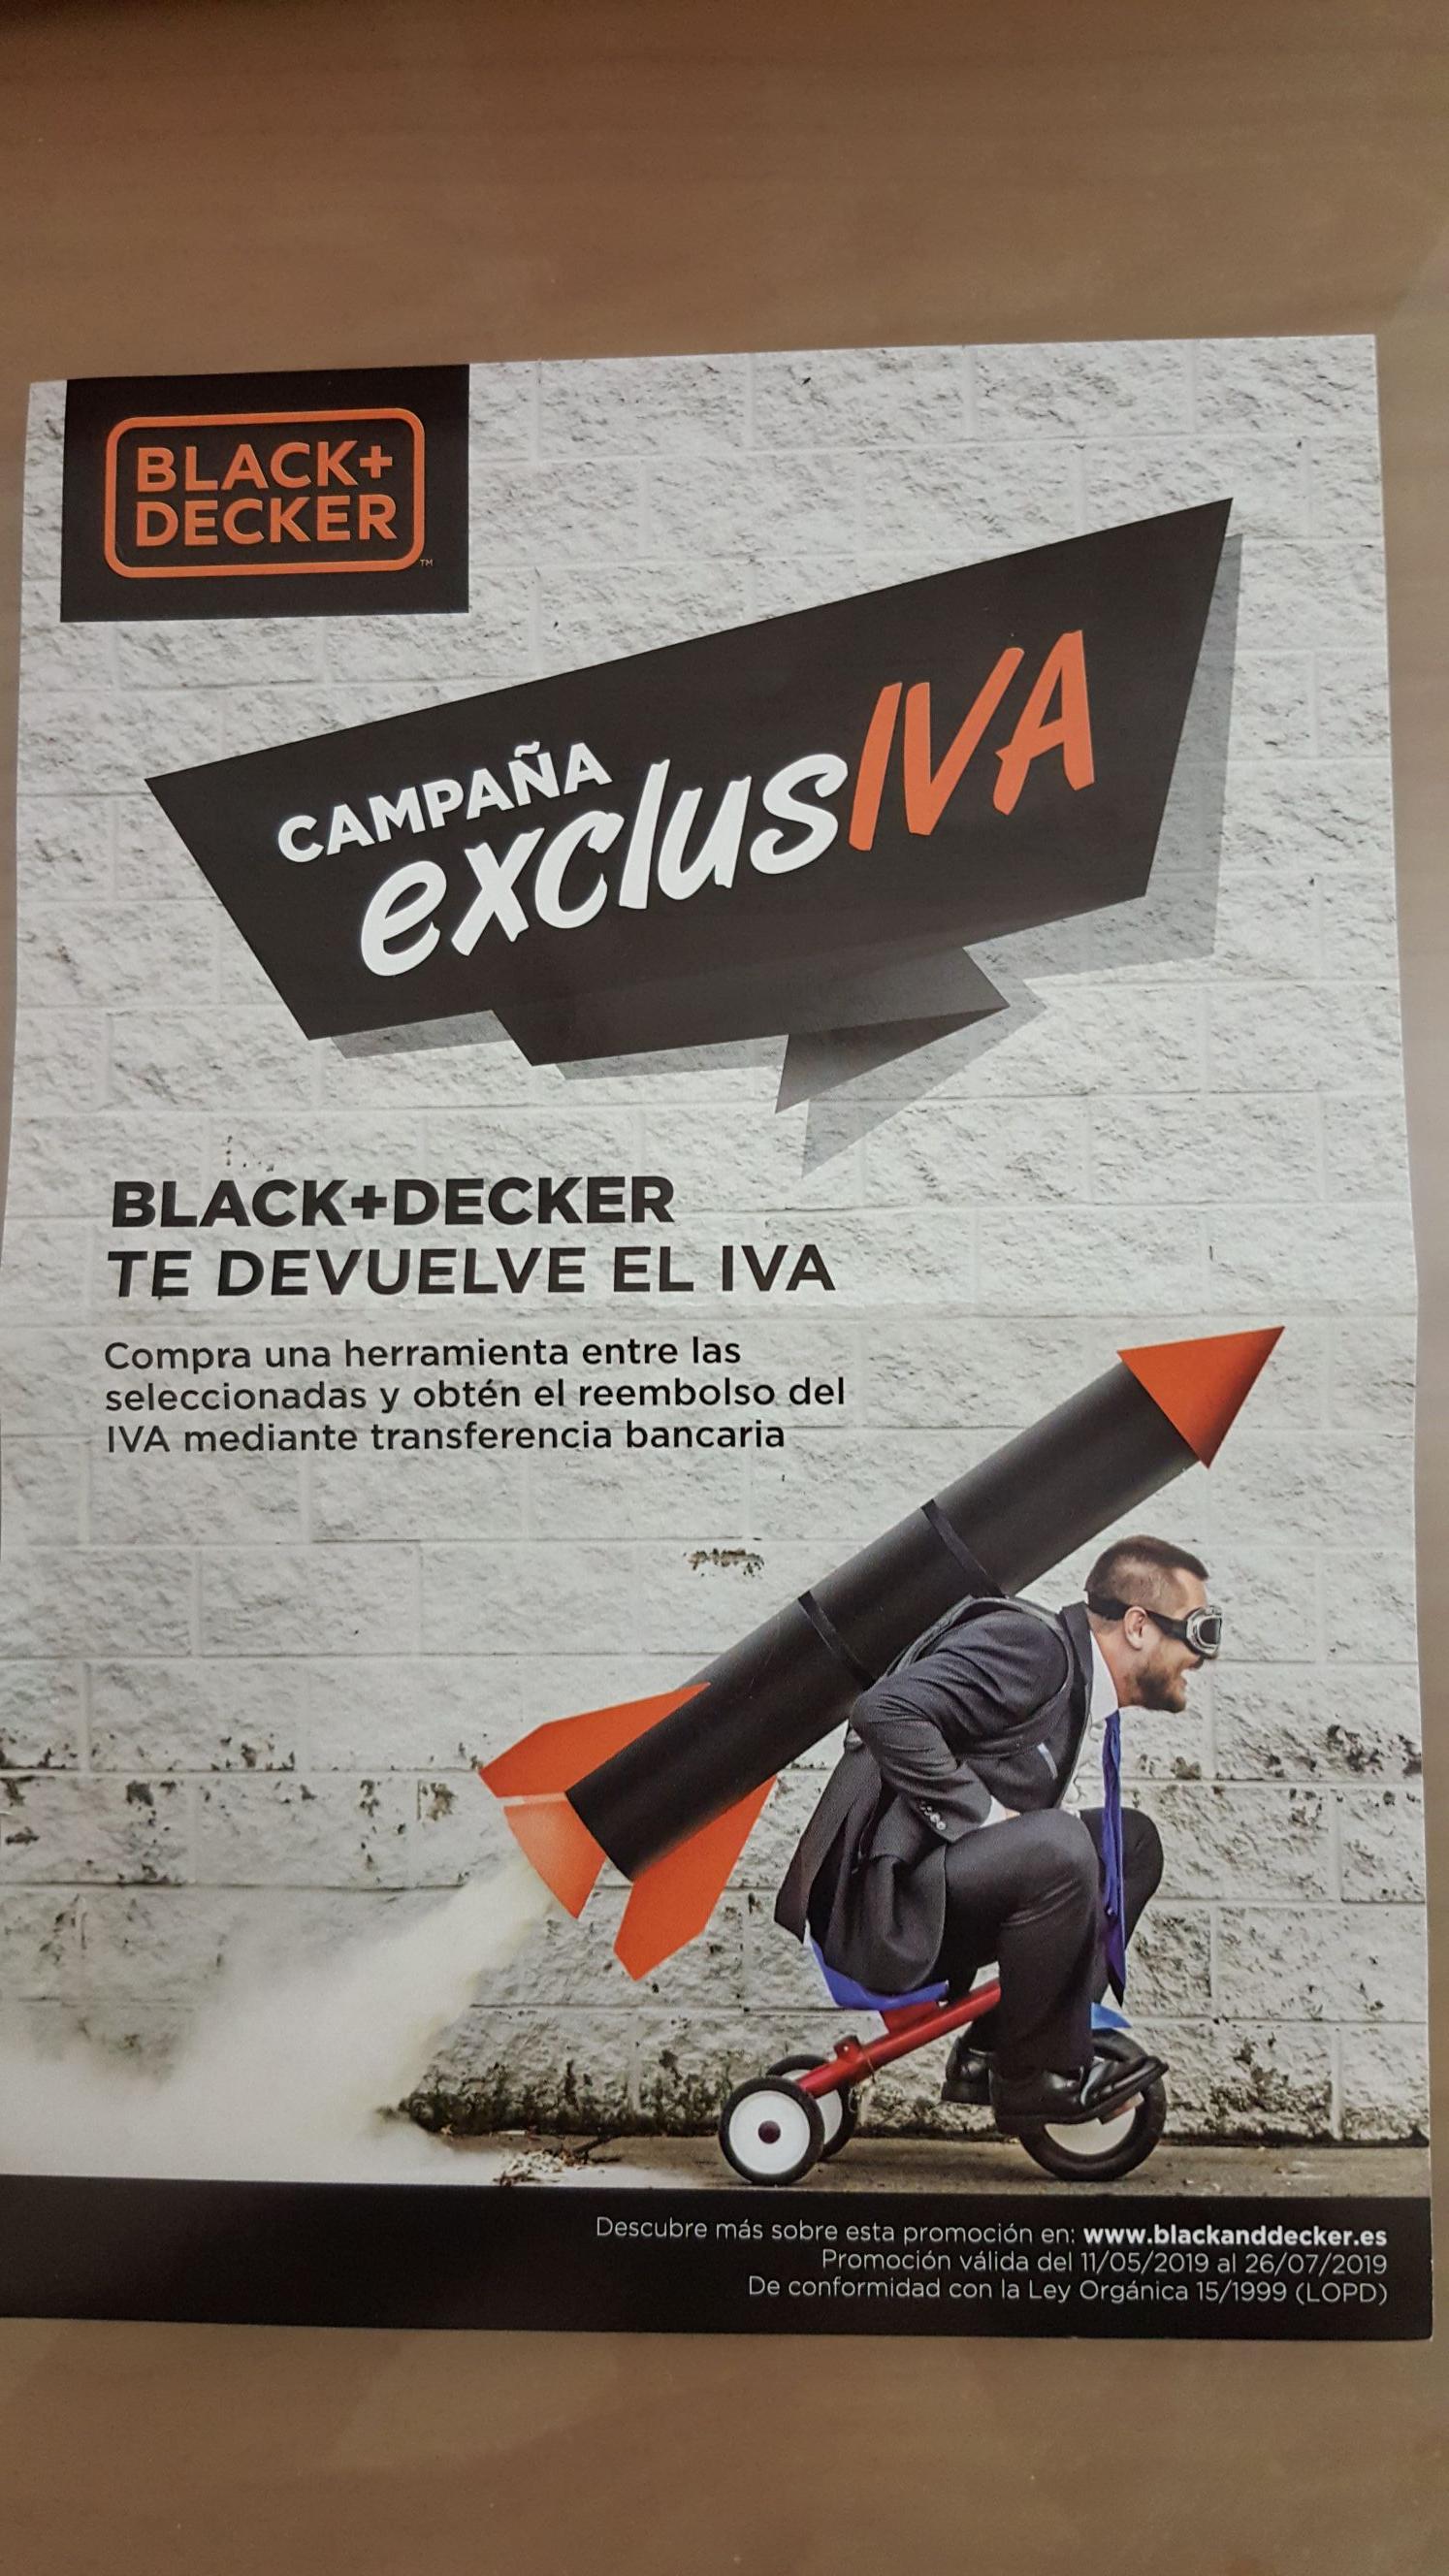 Black+decker te devuelve iva